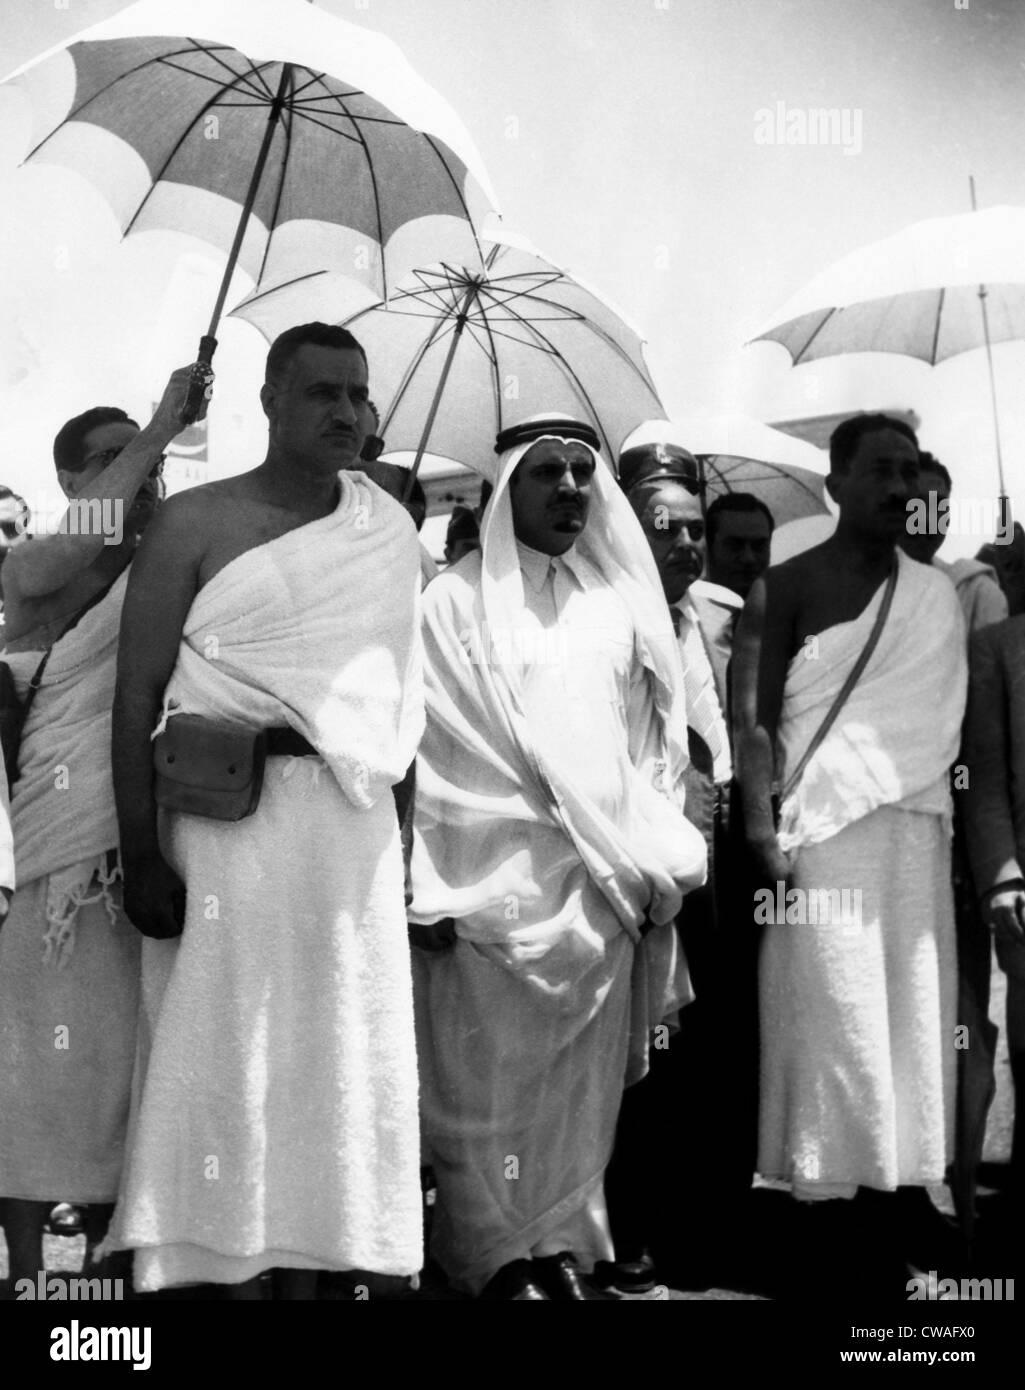 President of the United Arab Republic Gamal Abdel Nasser (forground, left), visiting King Saud of Saudi Arabia (with - Stock Image